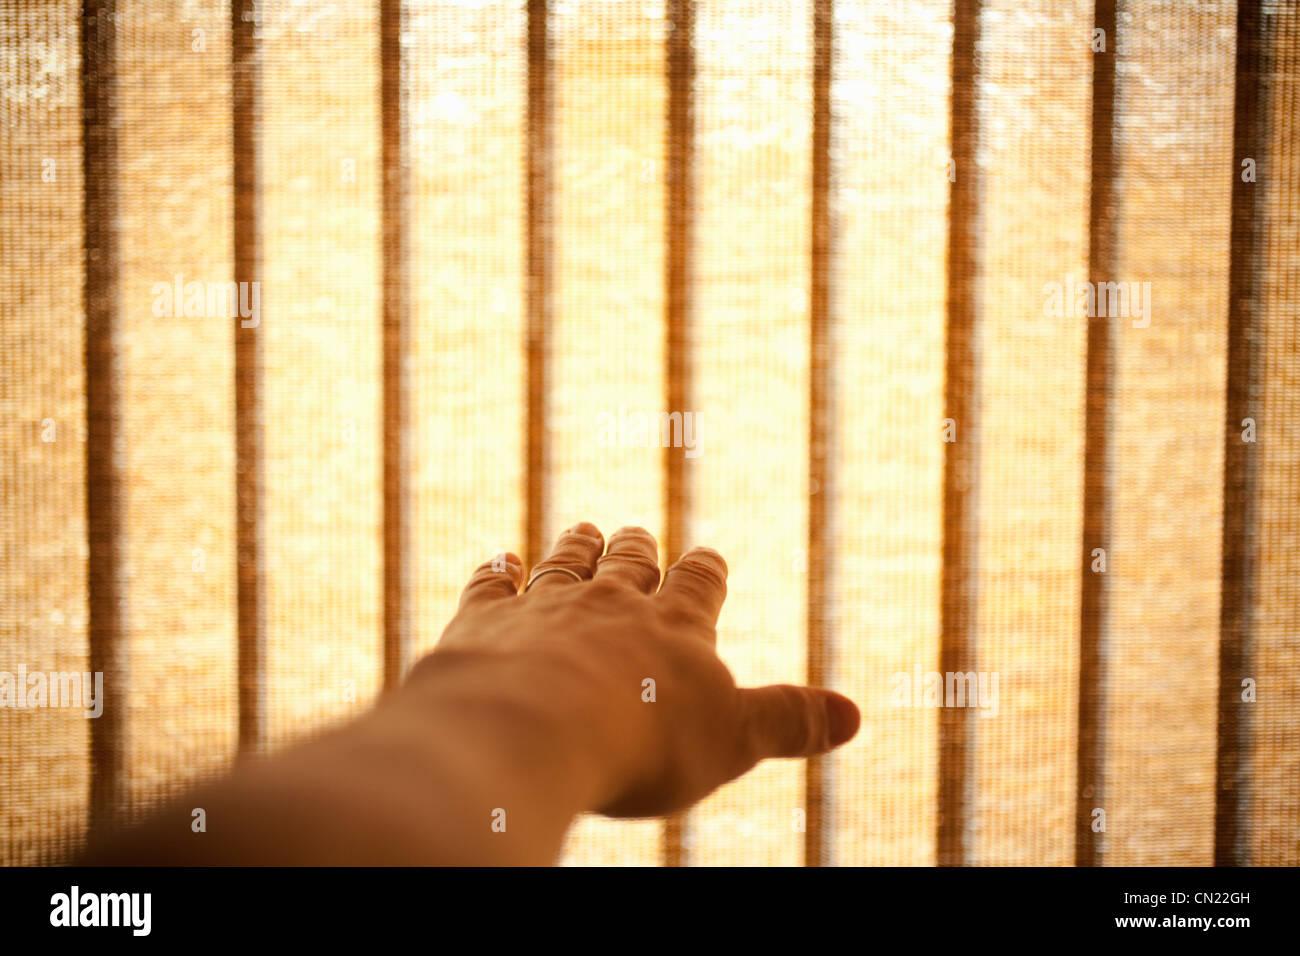 Die Hand und Frau Fenster blind Stockbild